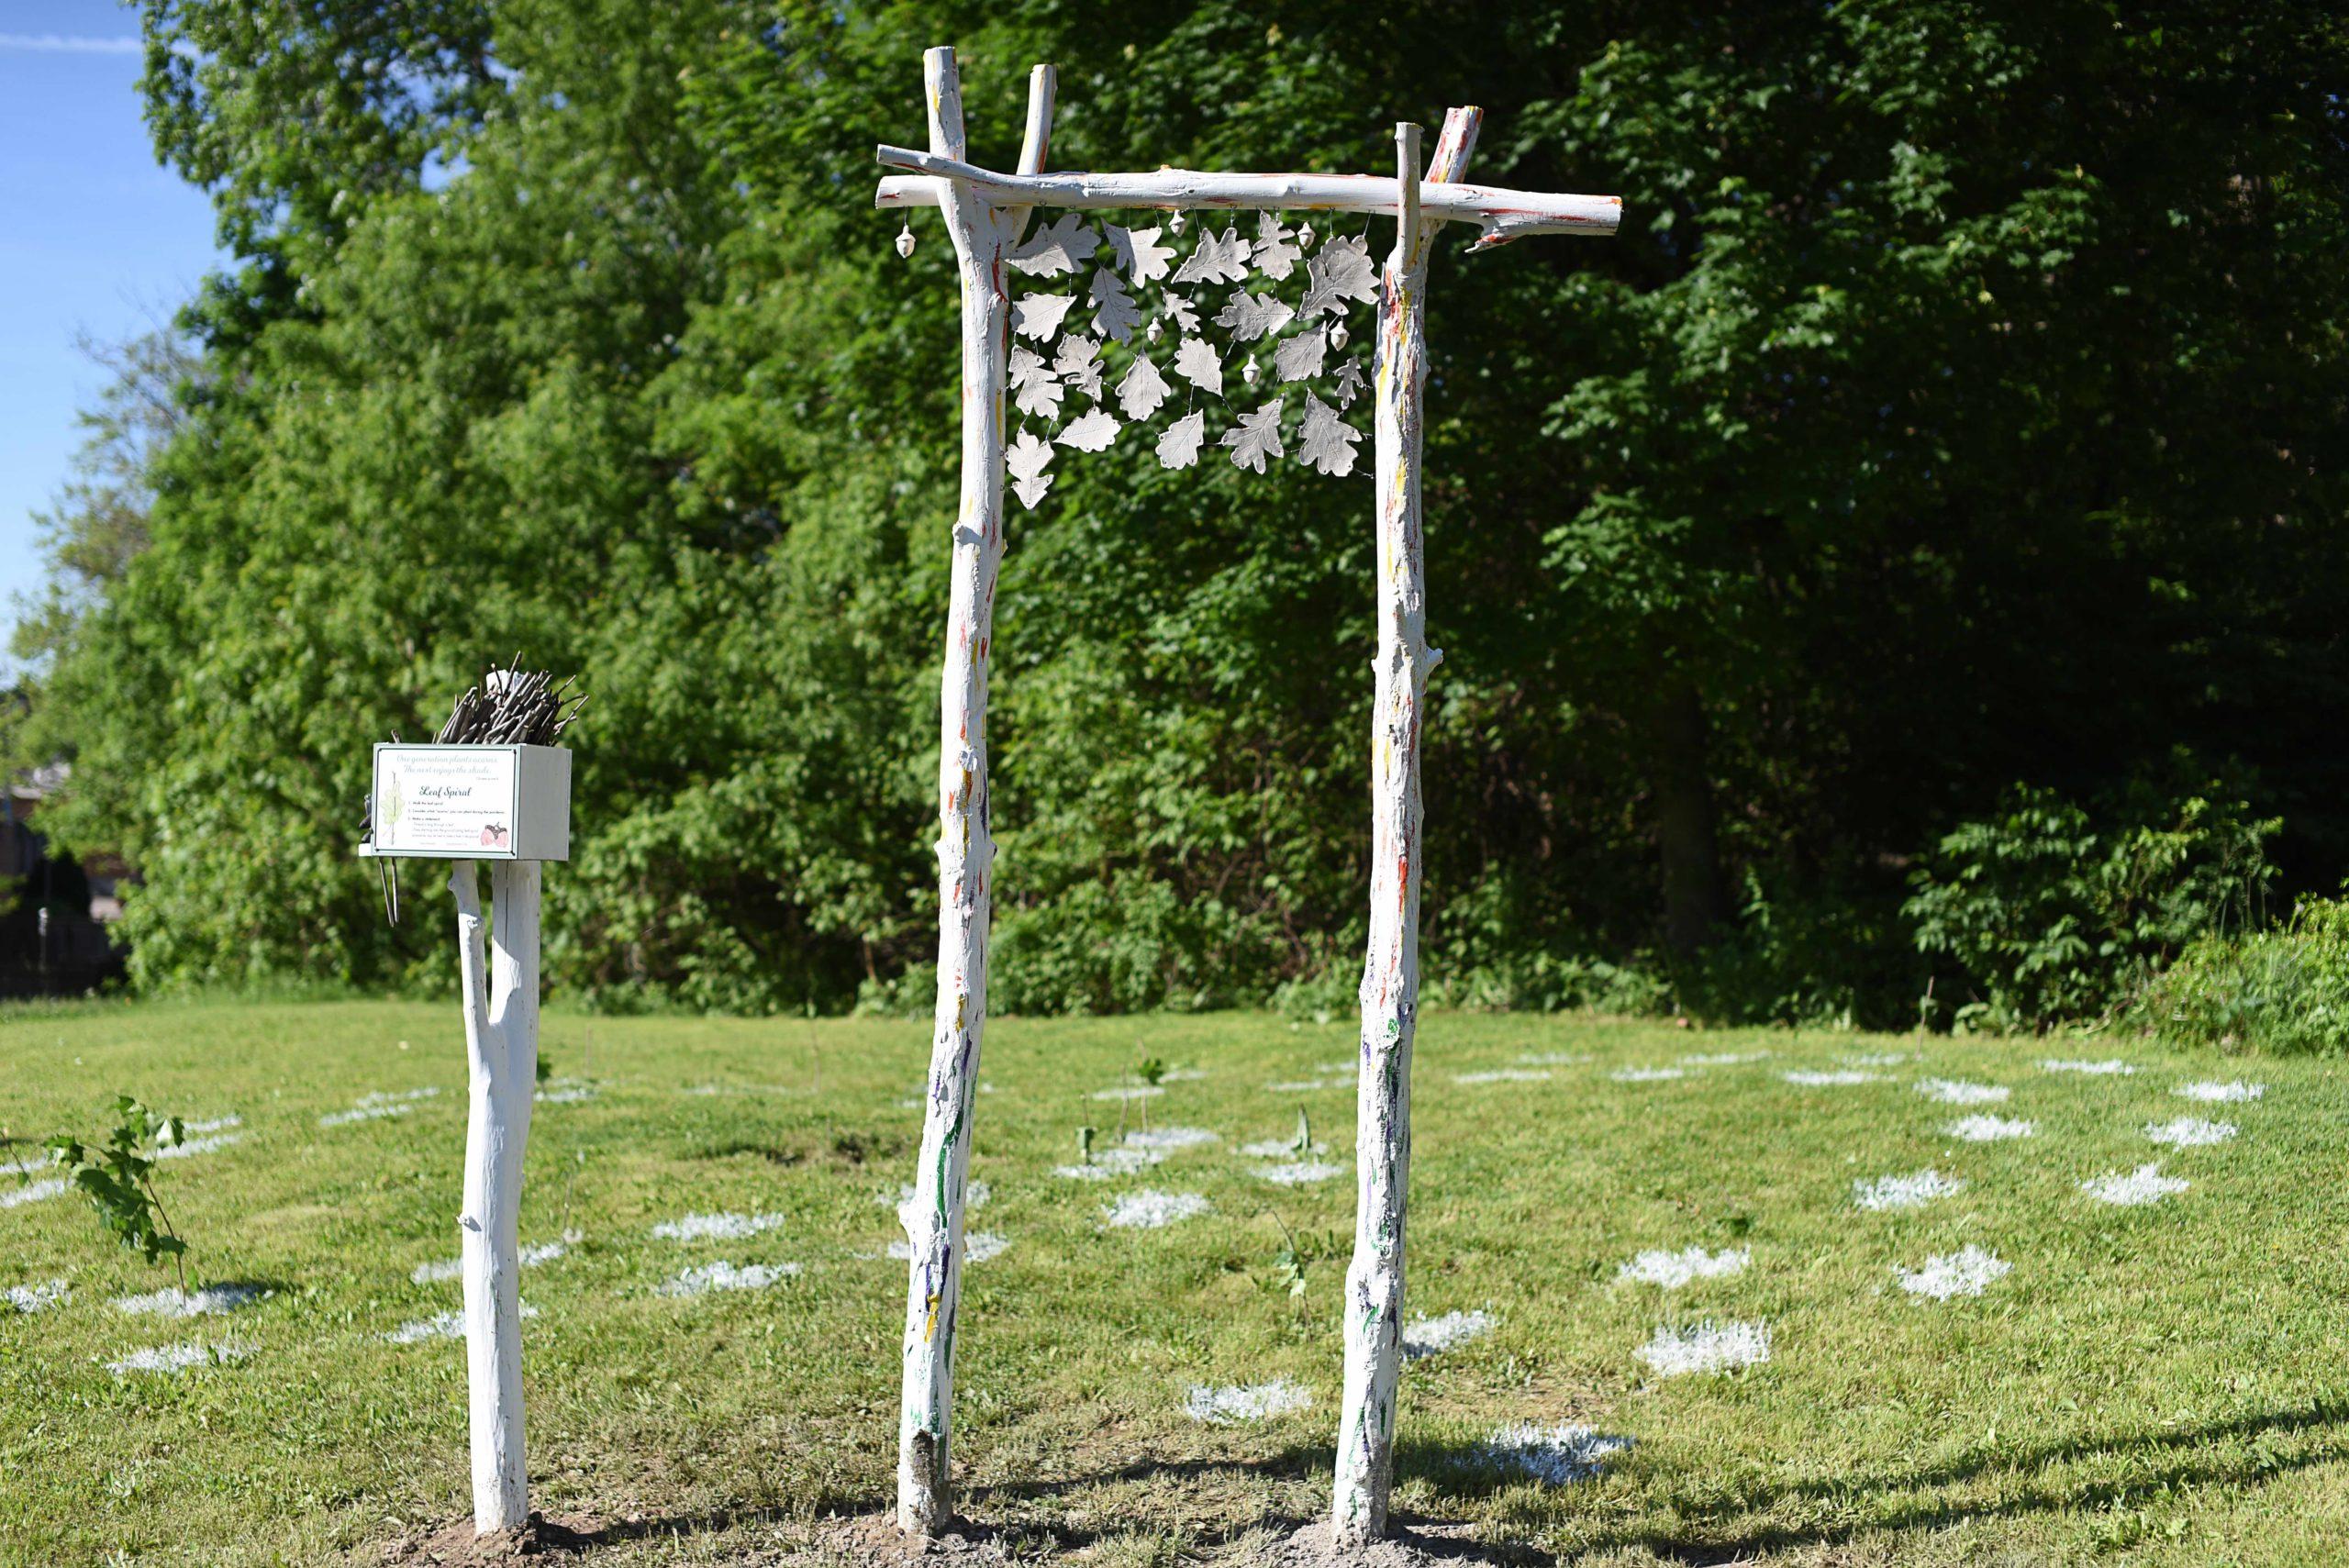 Metal Sculpture by Craig Hinshaw titled Leaf Gate